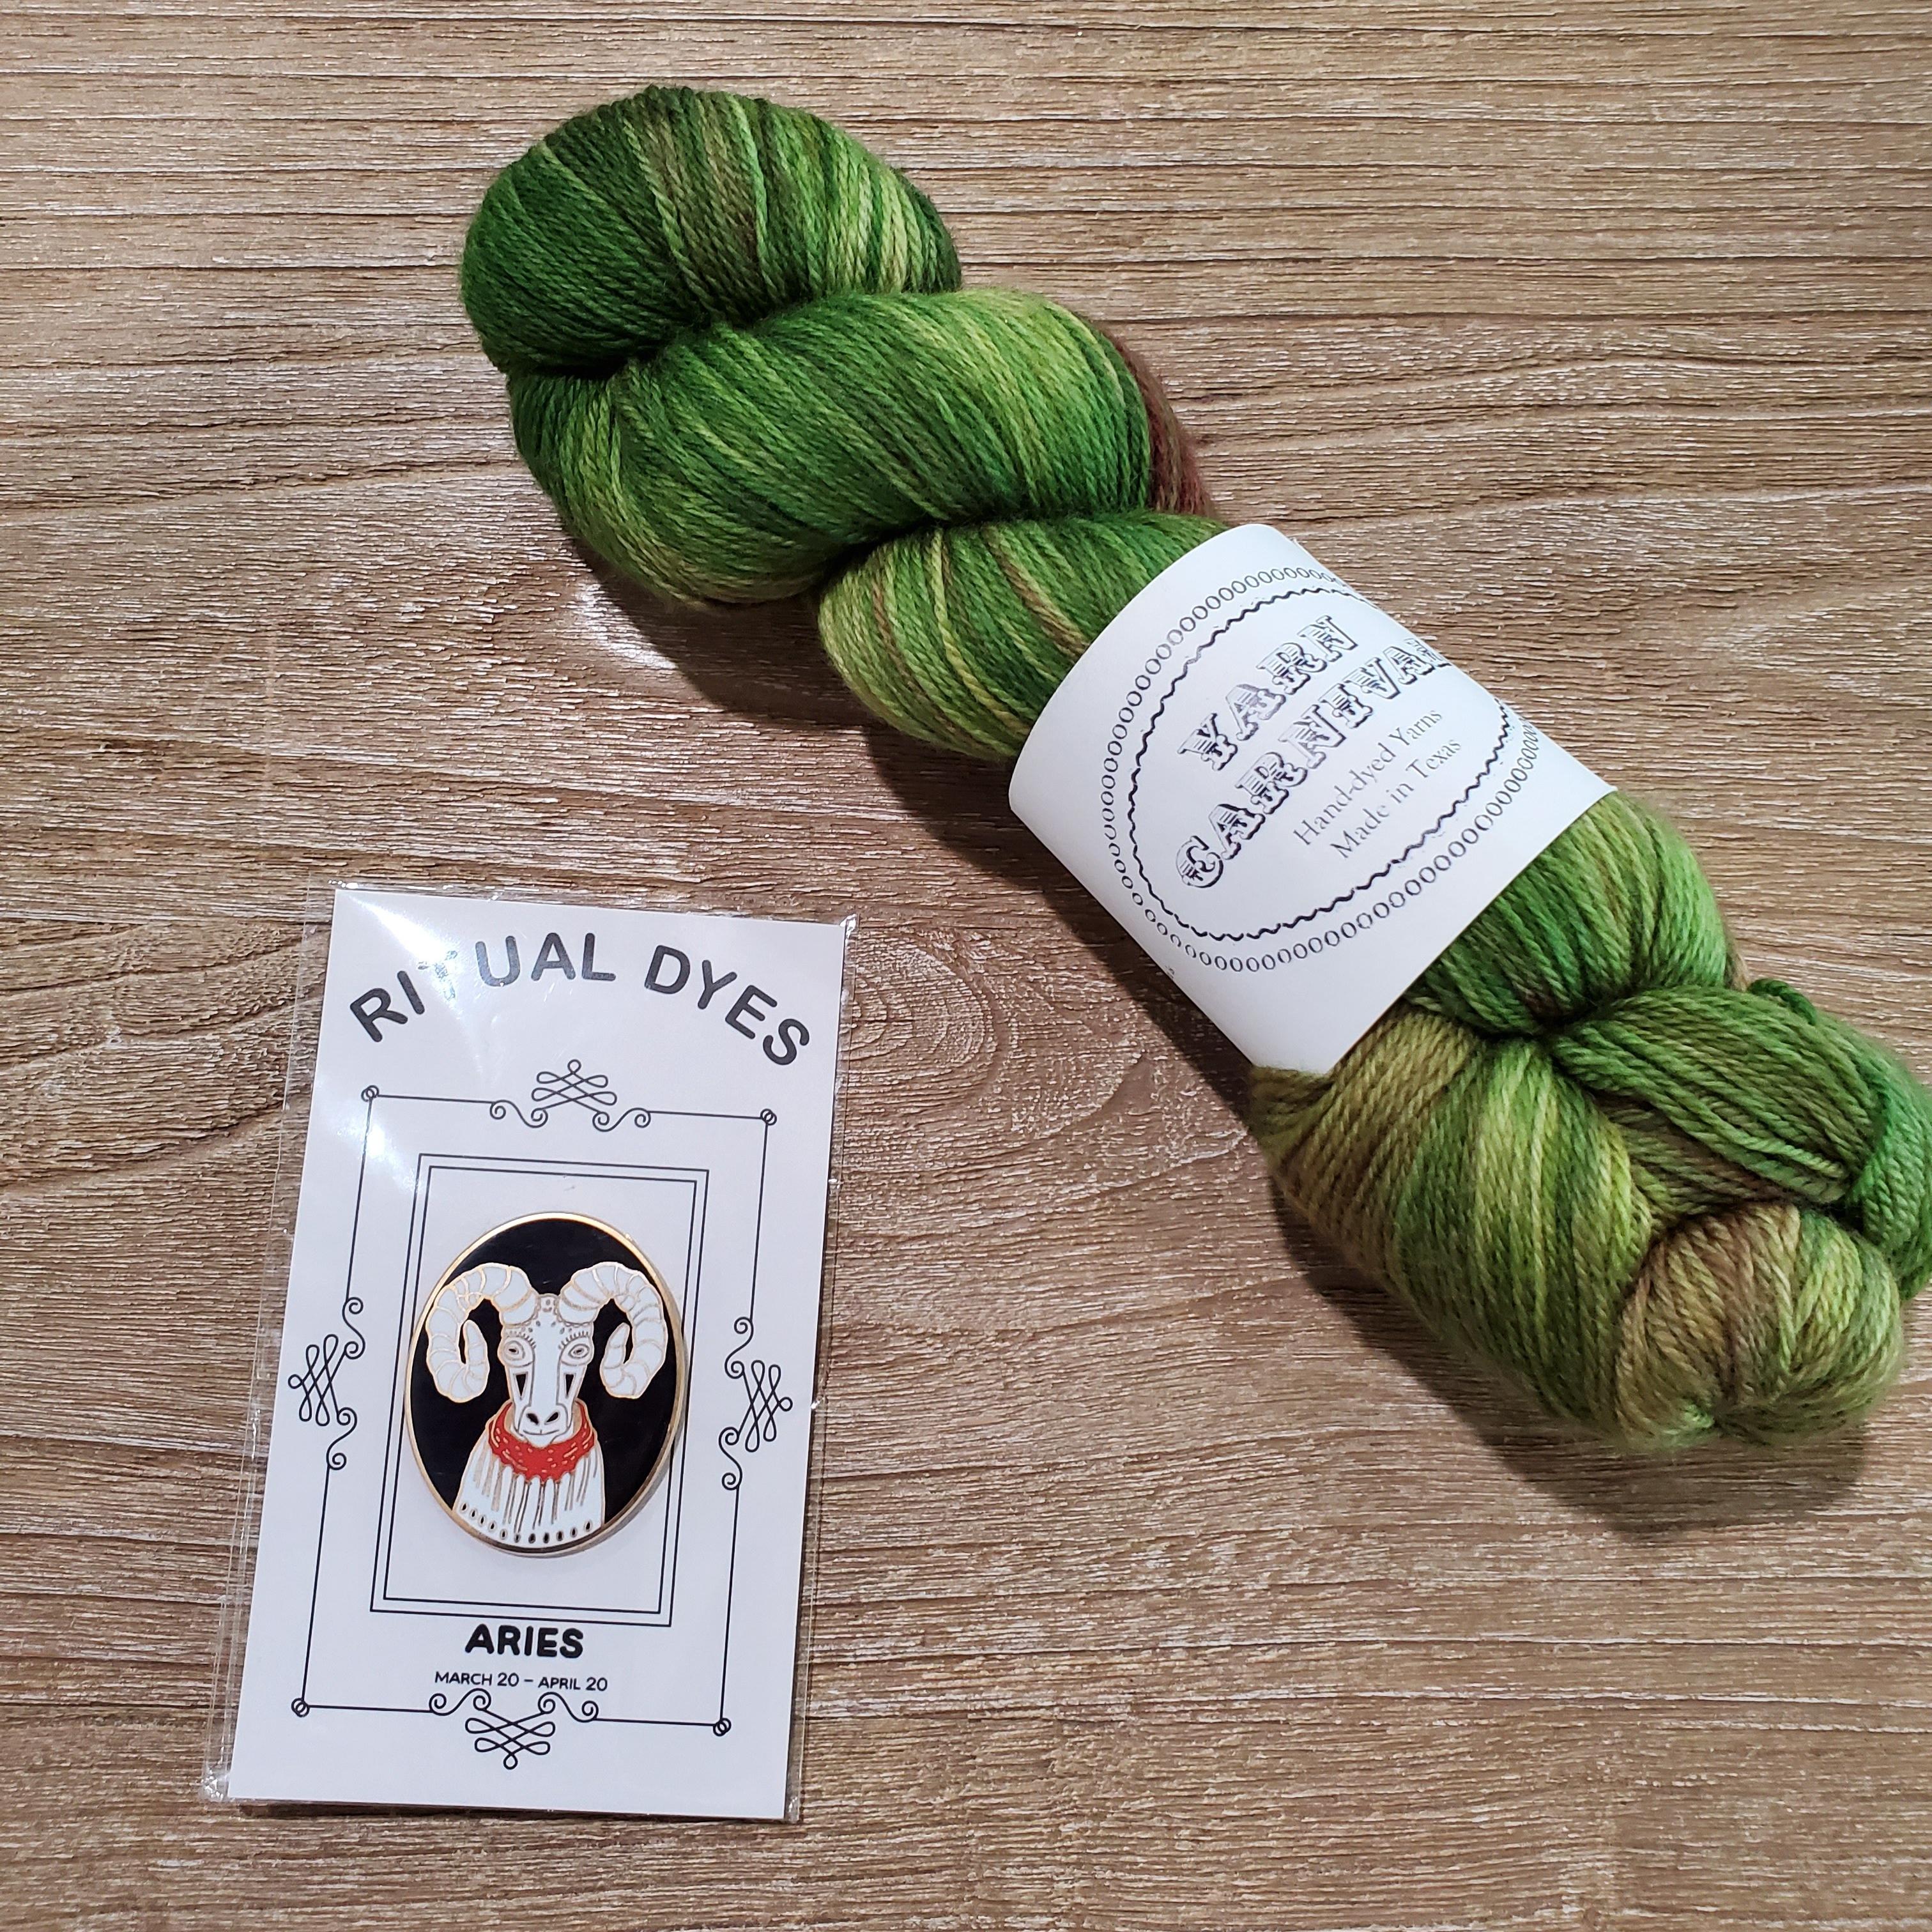 ritual dyes pin yarn carnival skein